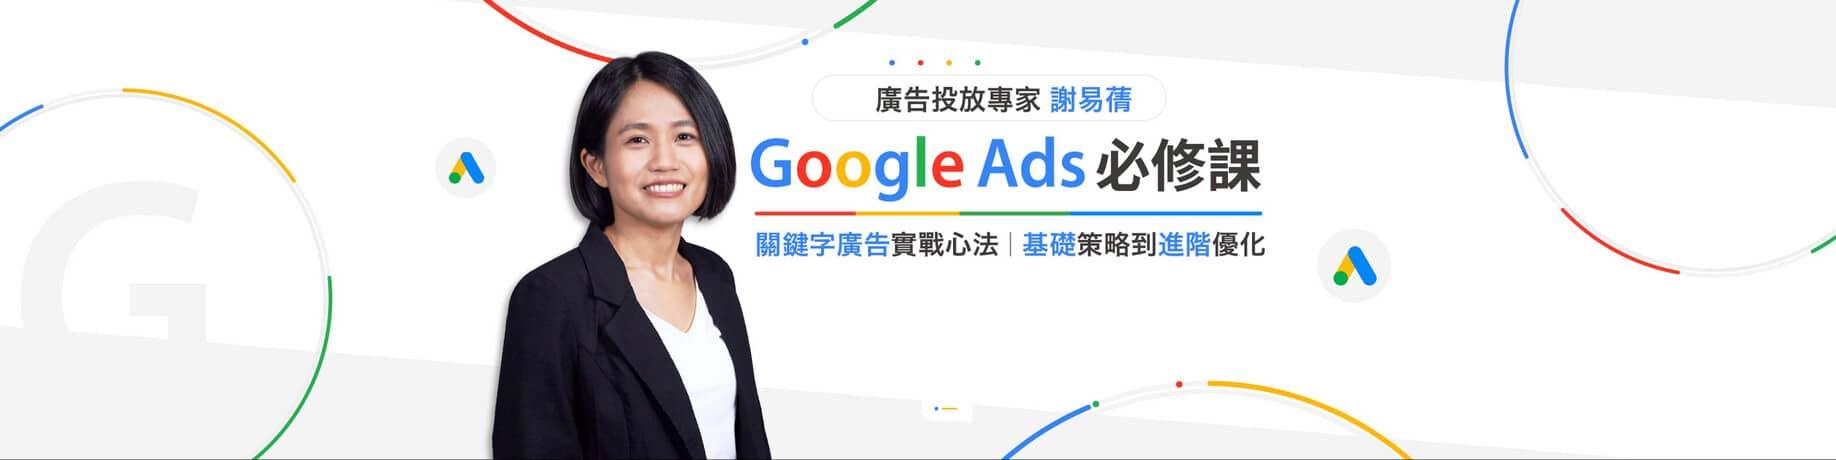 Google Ads 必修課 : 關鍵字廣告實戰心法